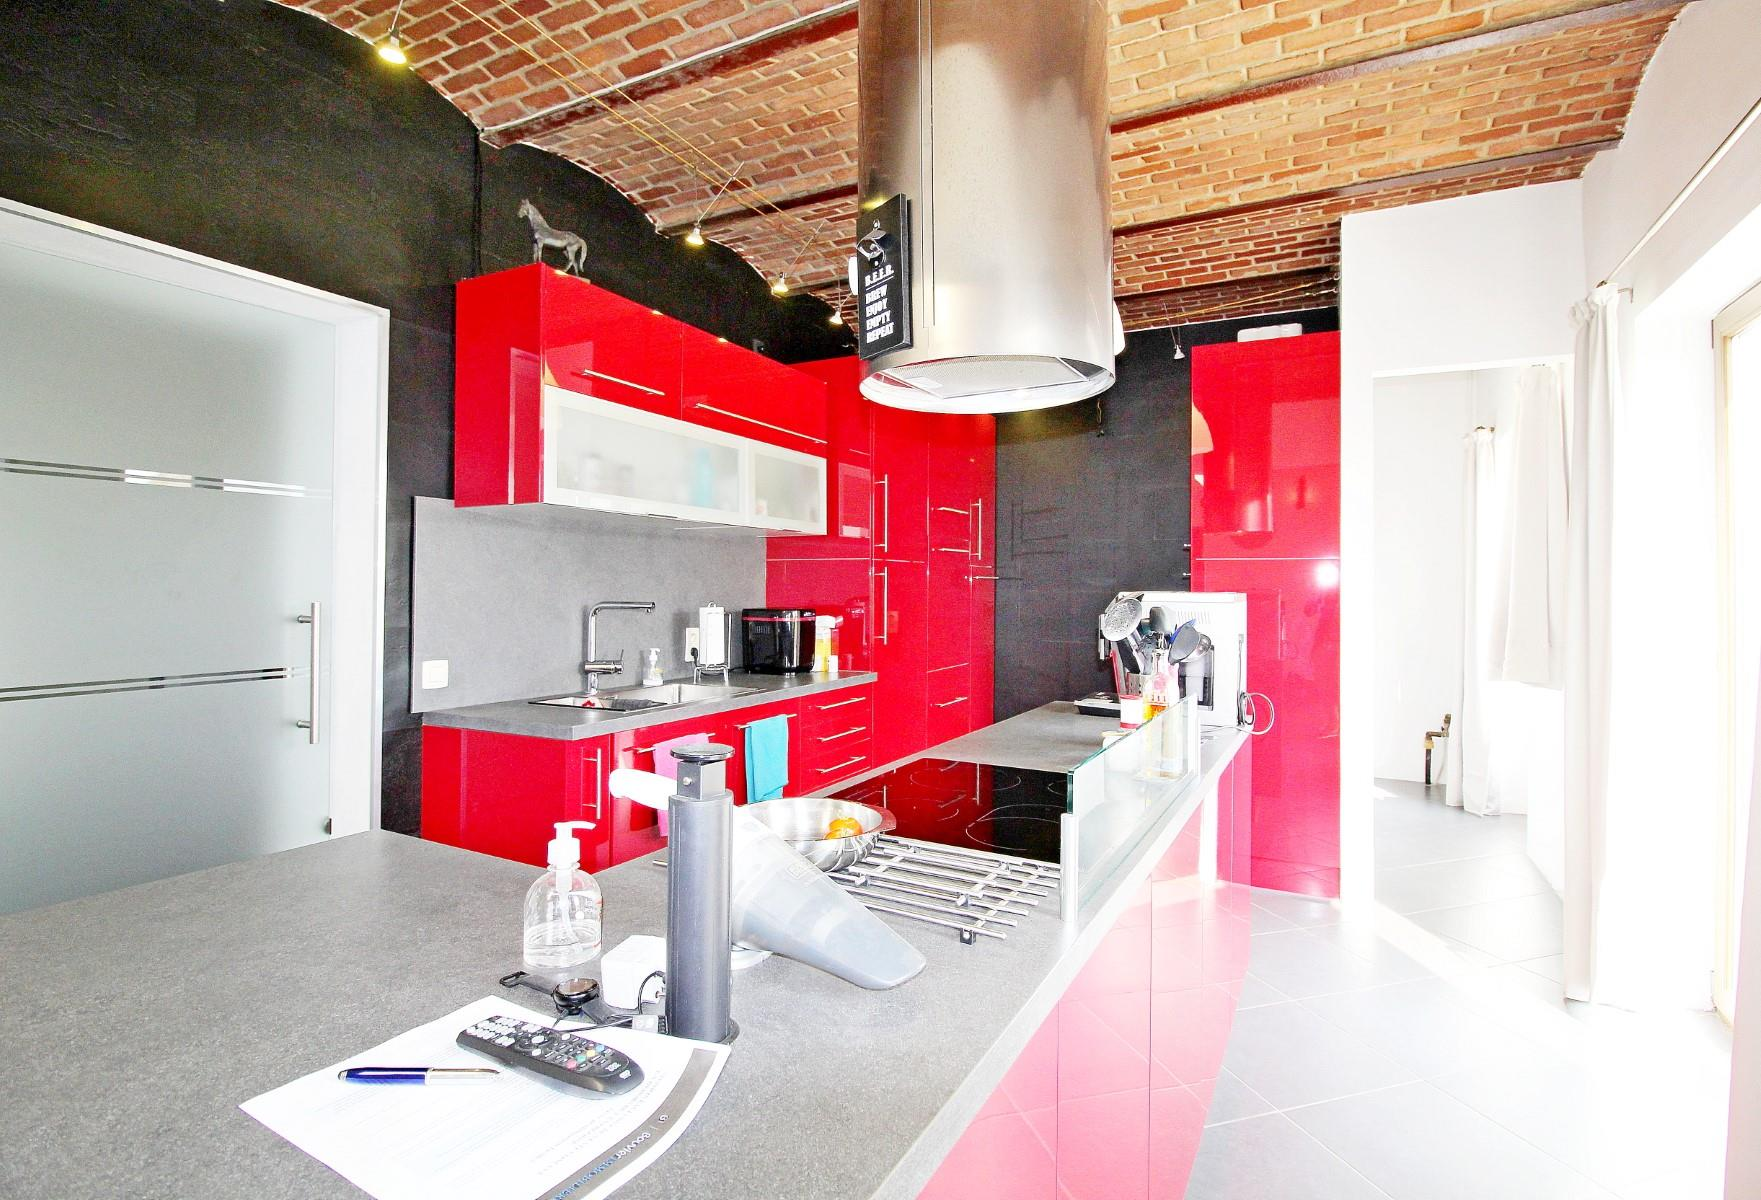 Maison - Bolinne - #4164476-6